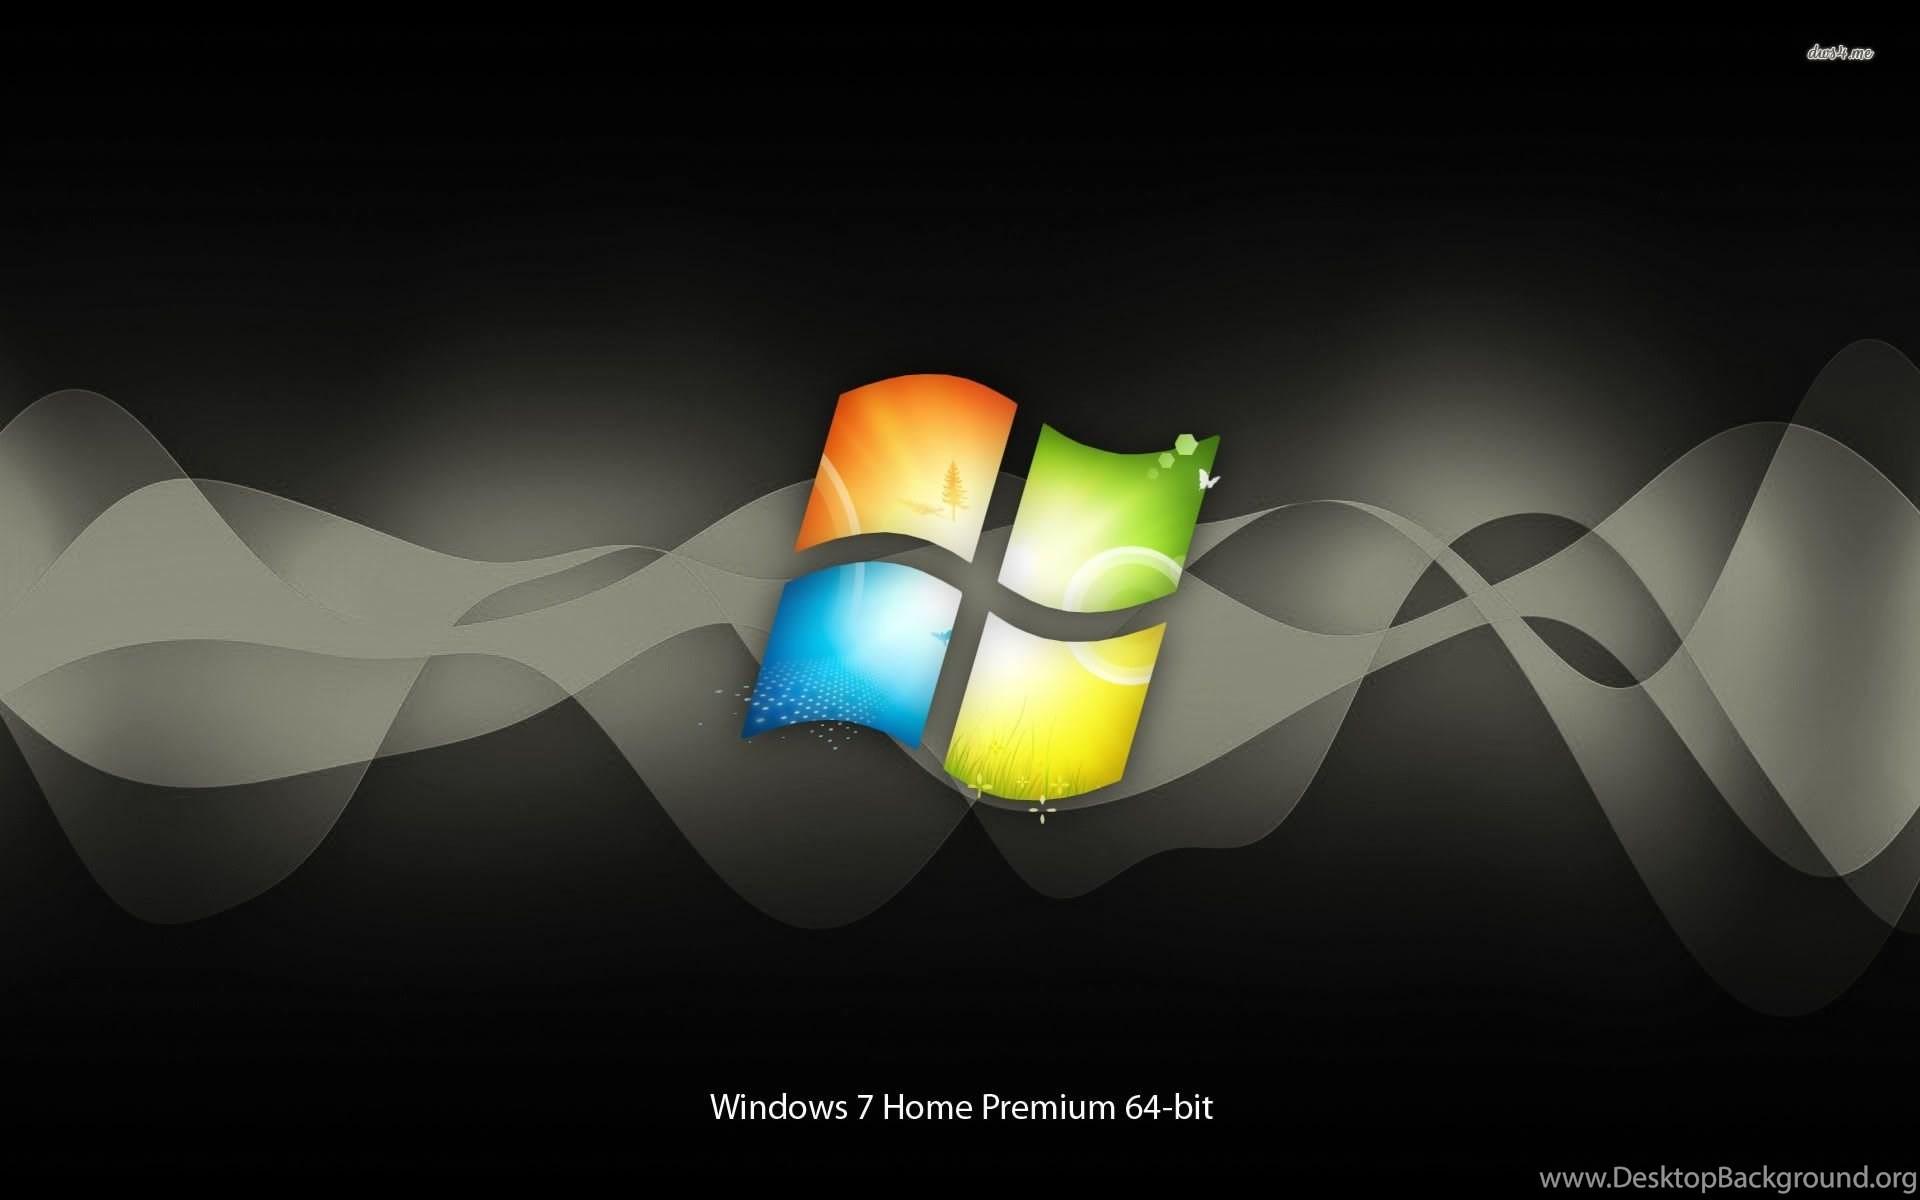 Windows 7 Home Premium Wallpaper ①